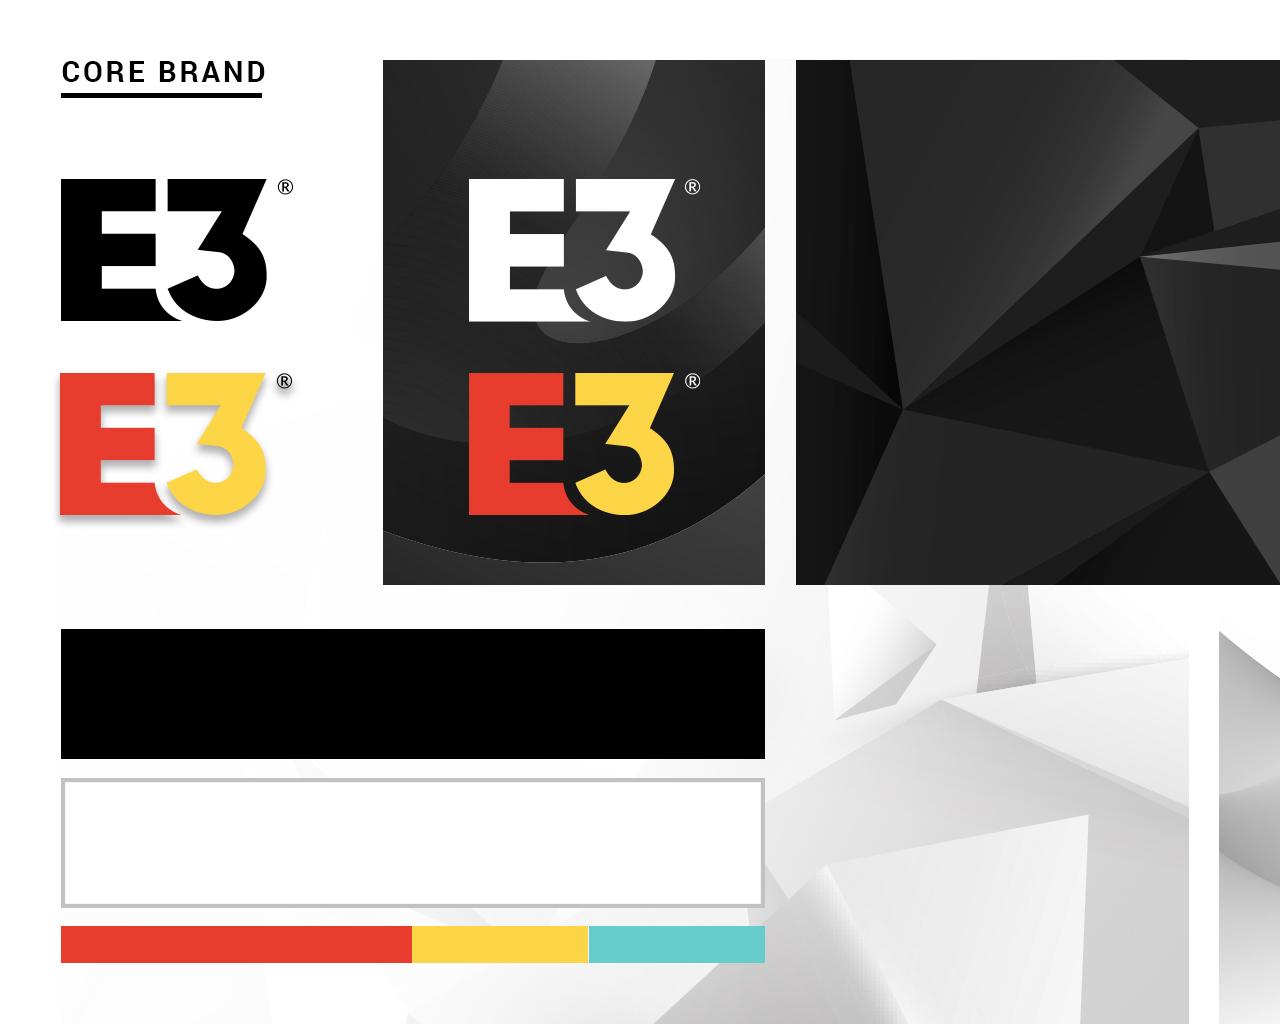 Grid detailing the E3 2021 core brand